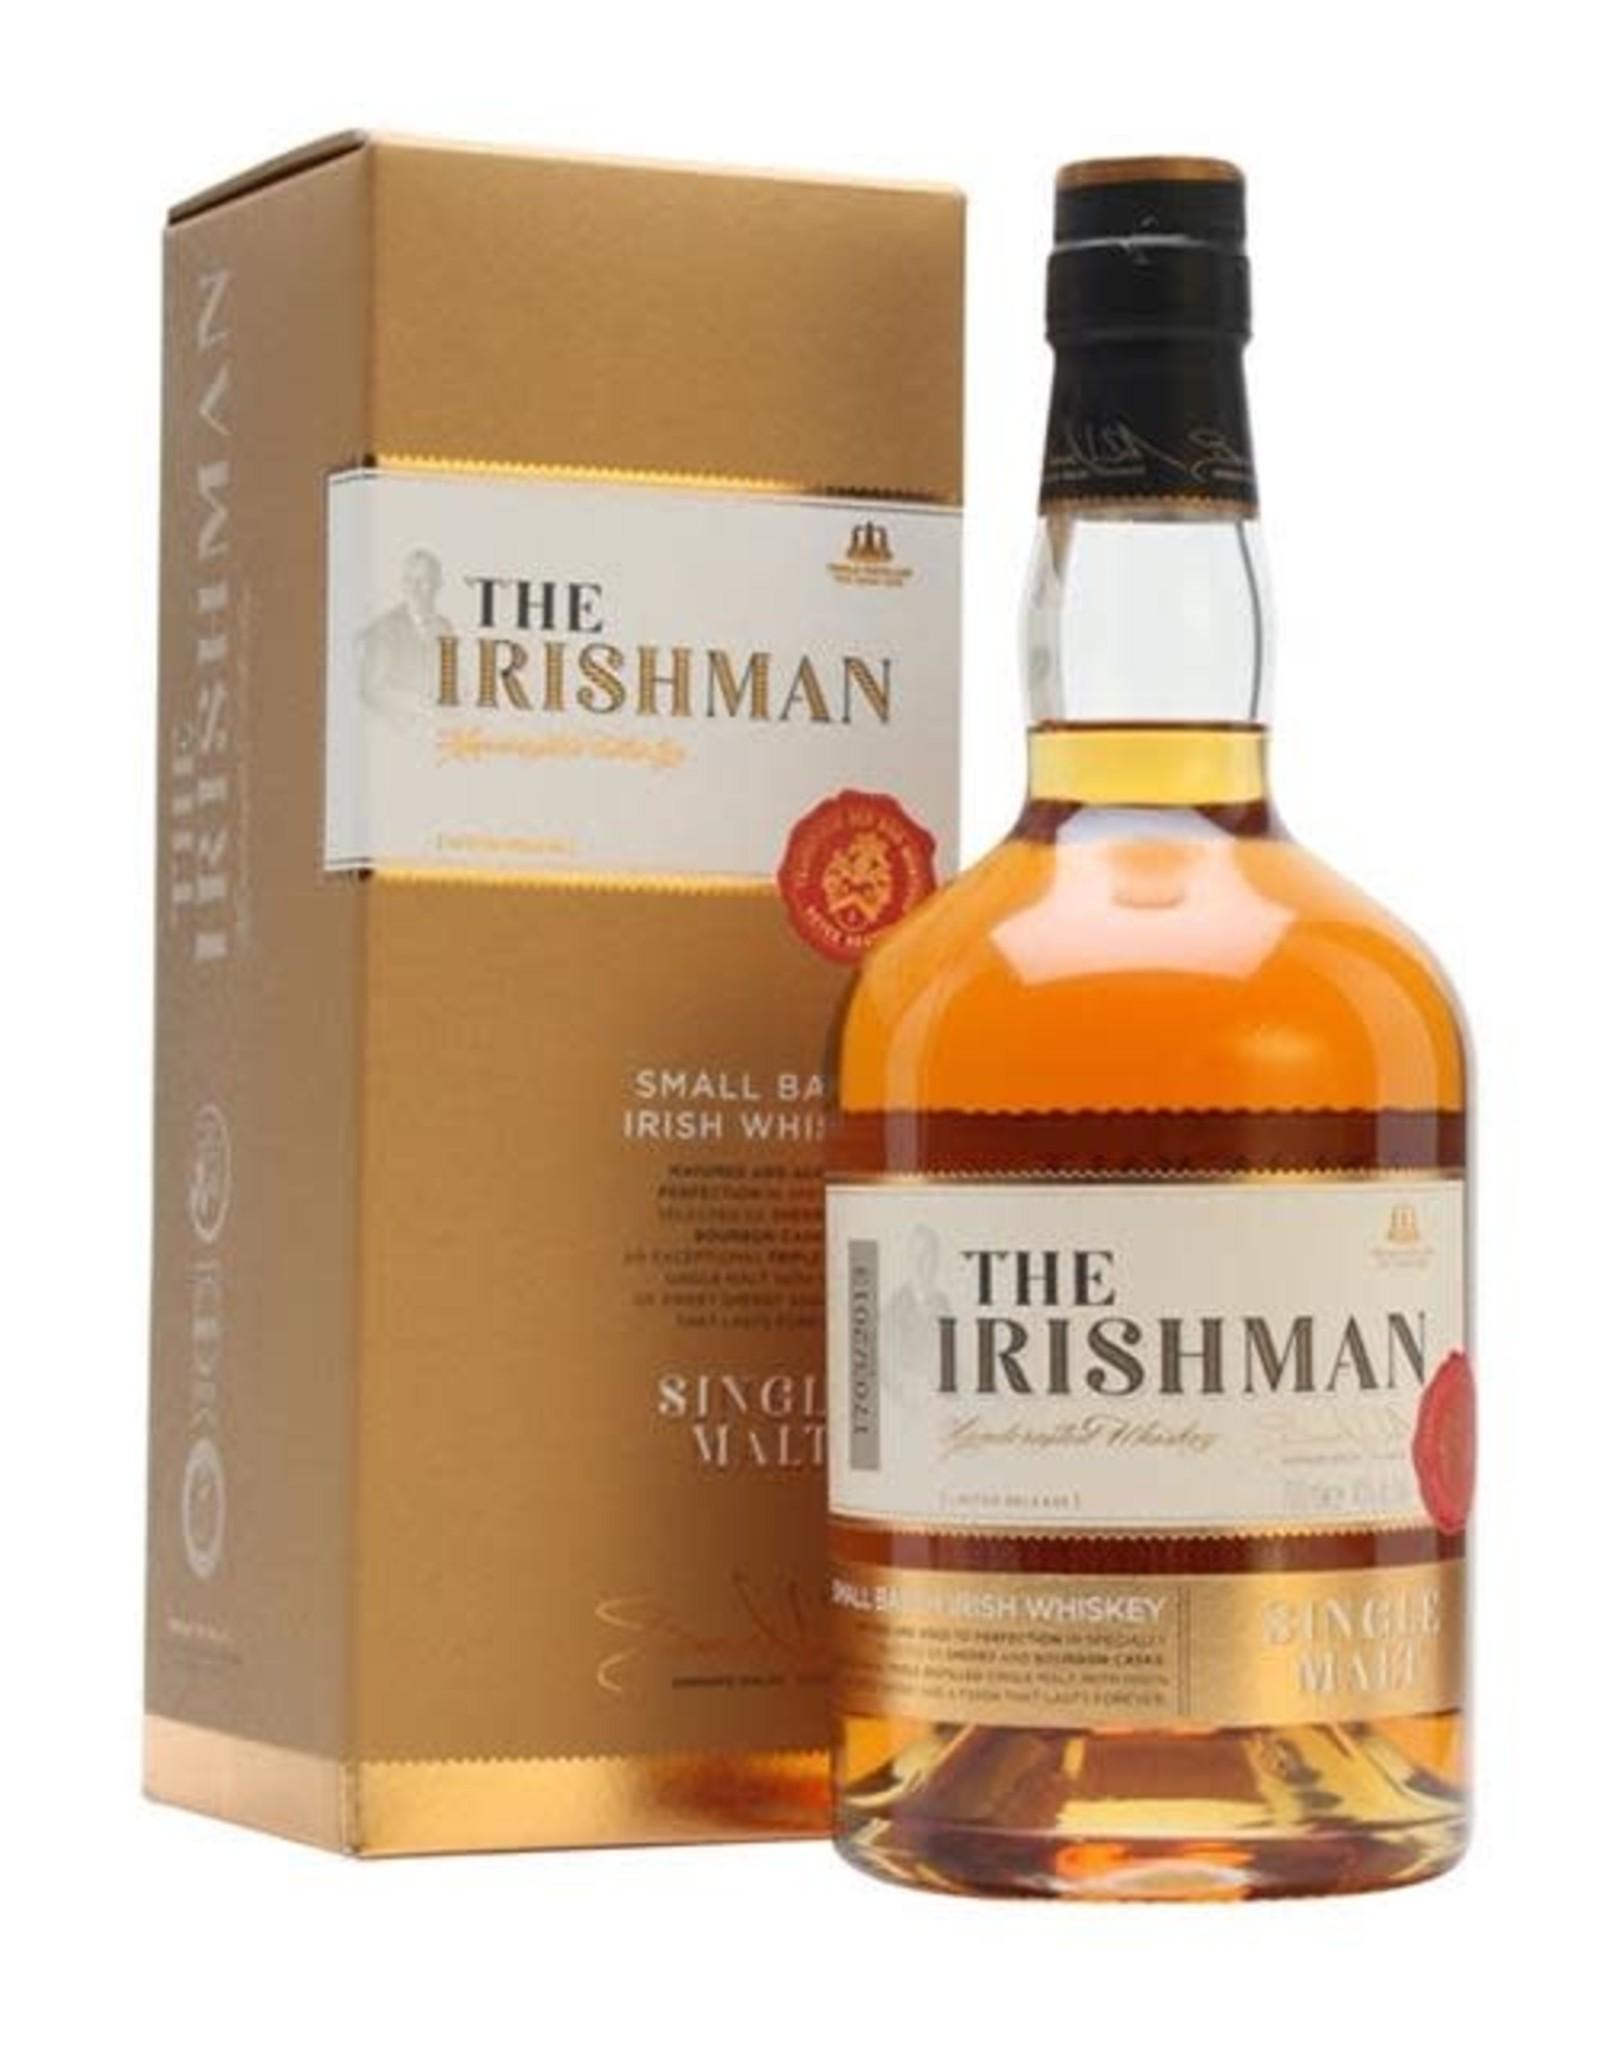 THE IRISHMAN SINGLE MALT WHISKEY 750ML